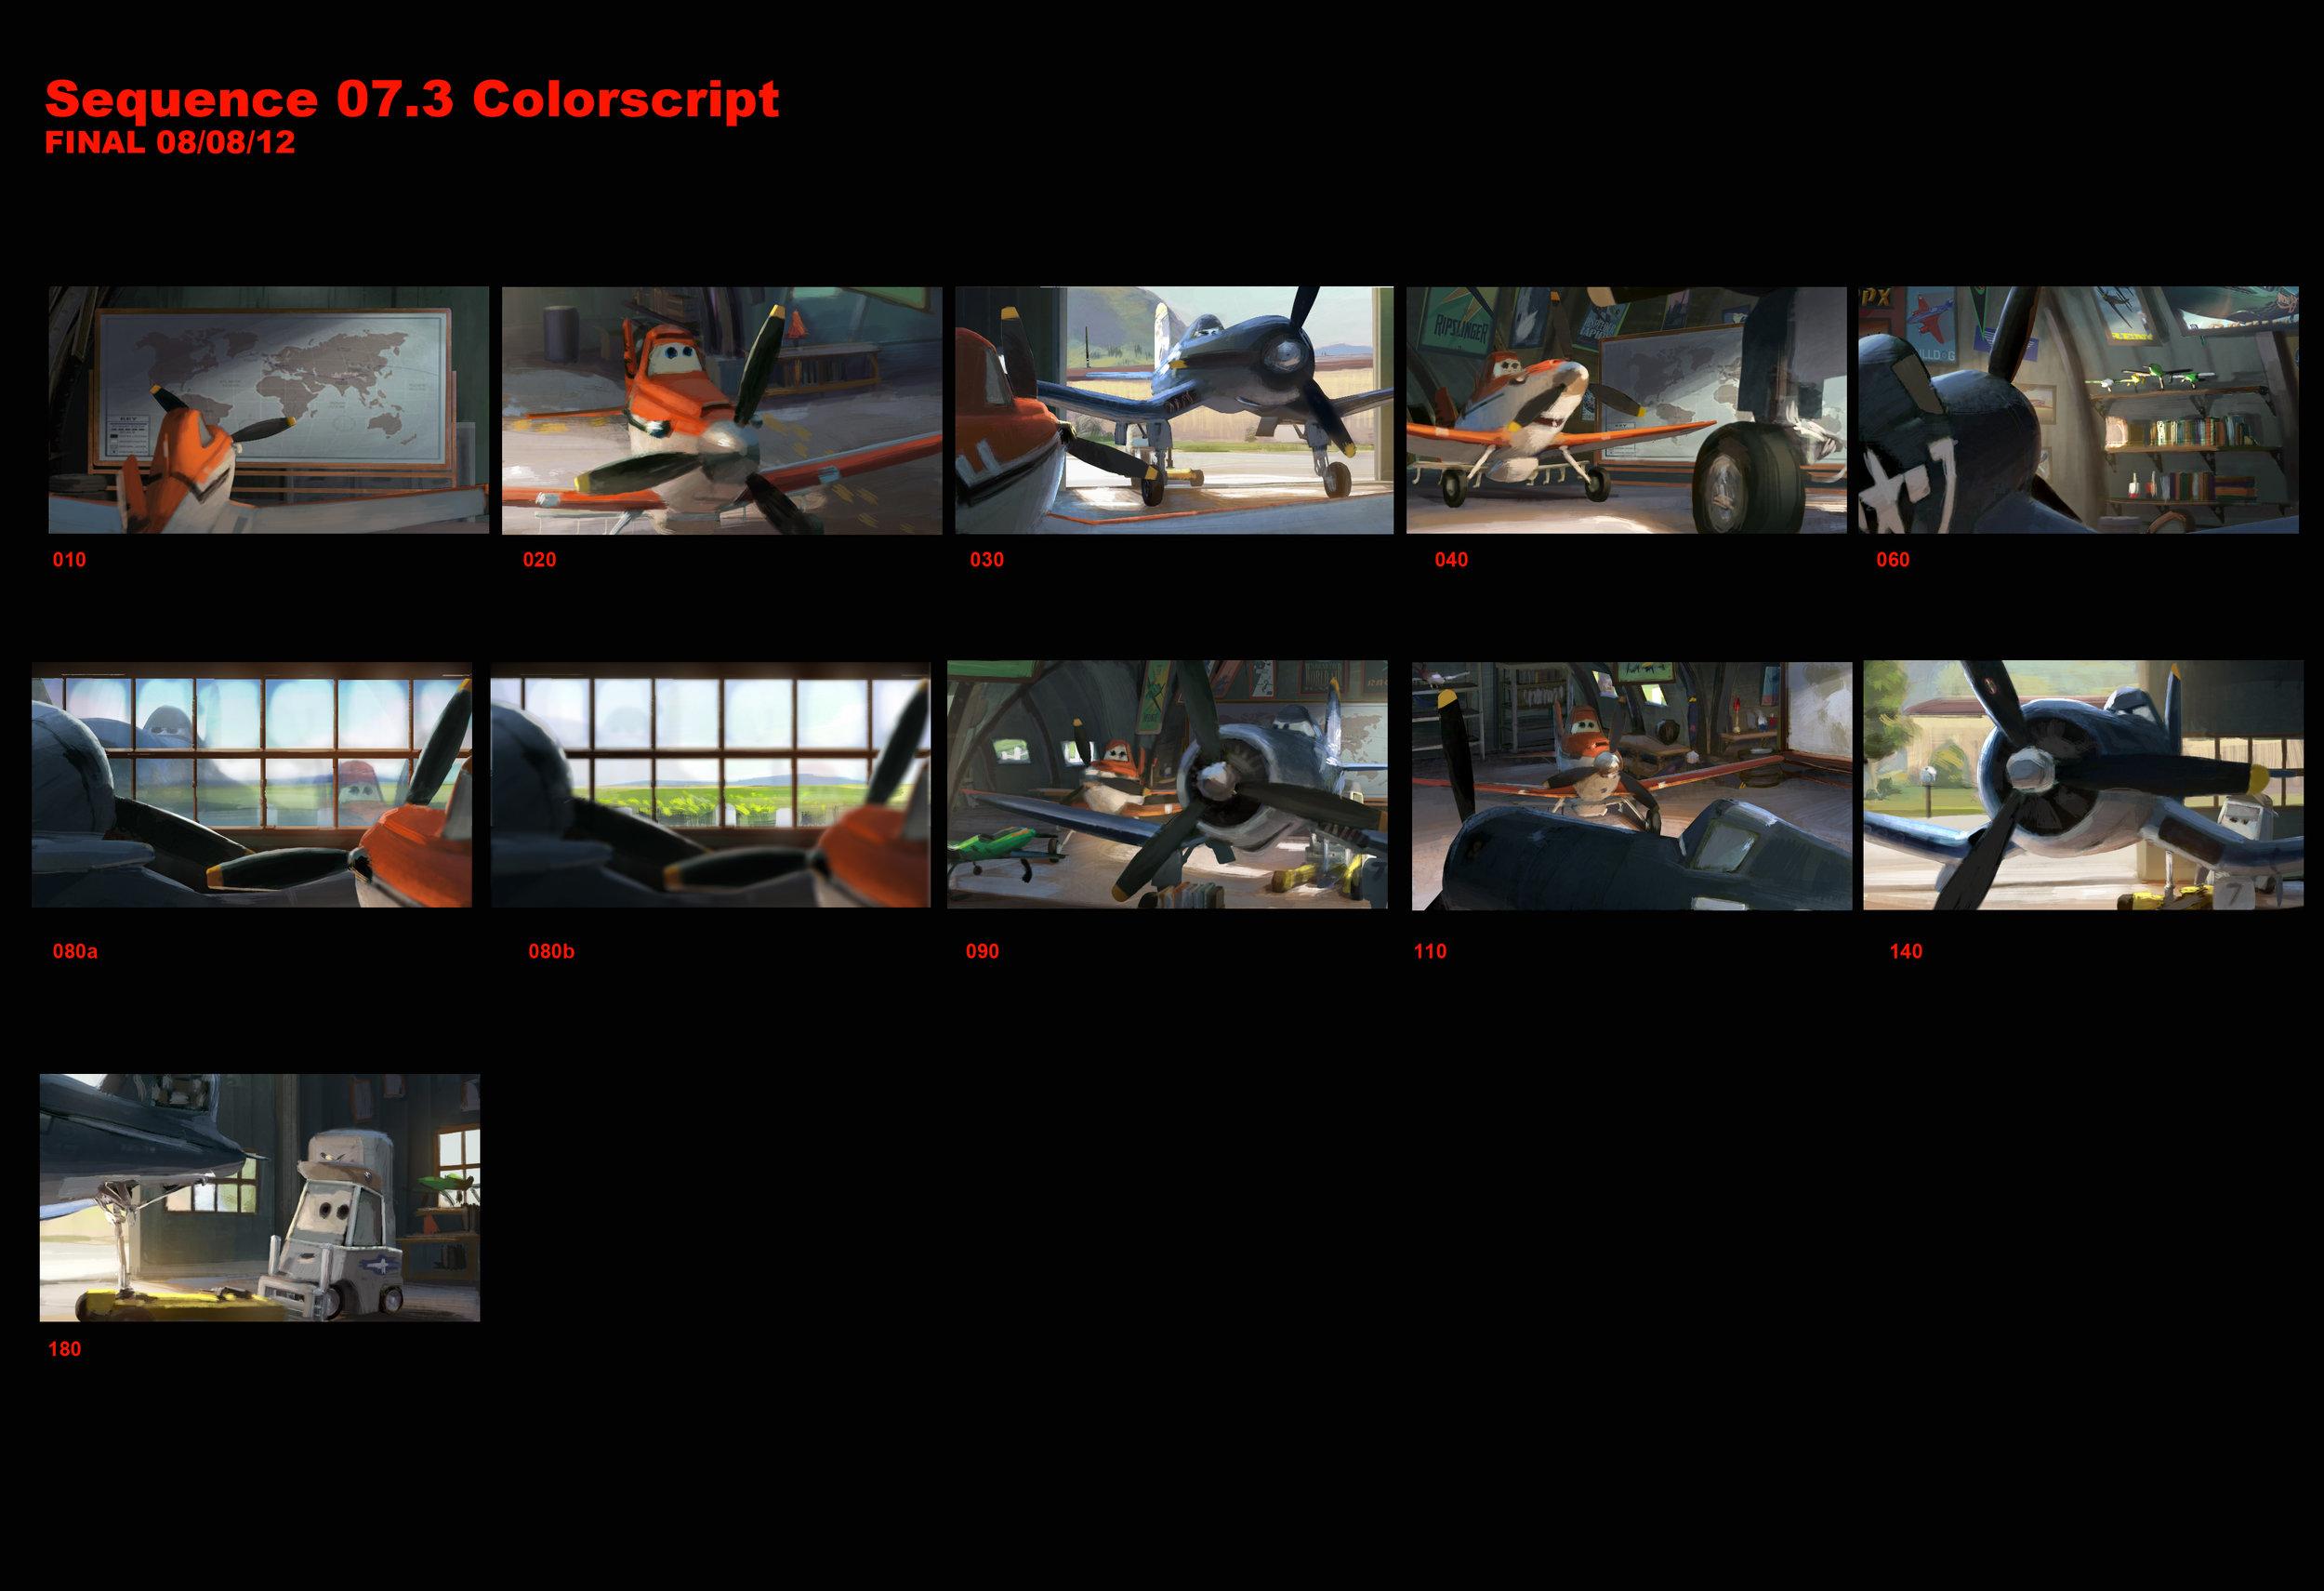 07.3_Colorscript_v002.jpg